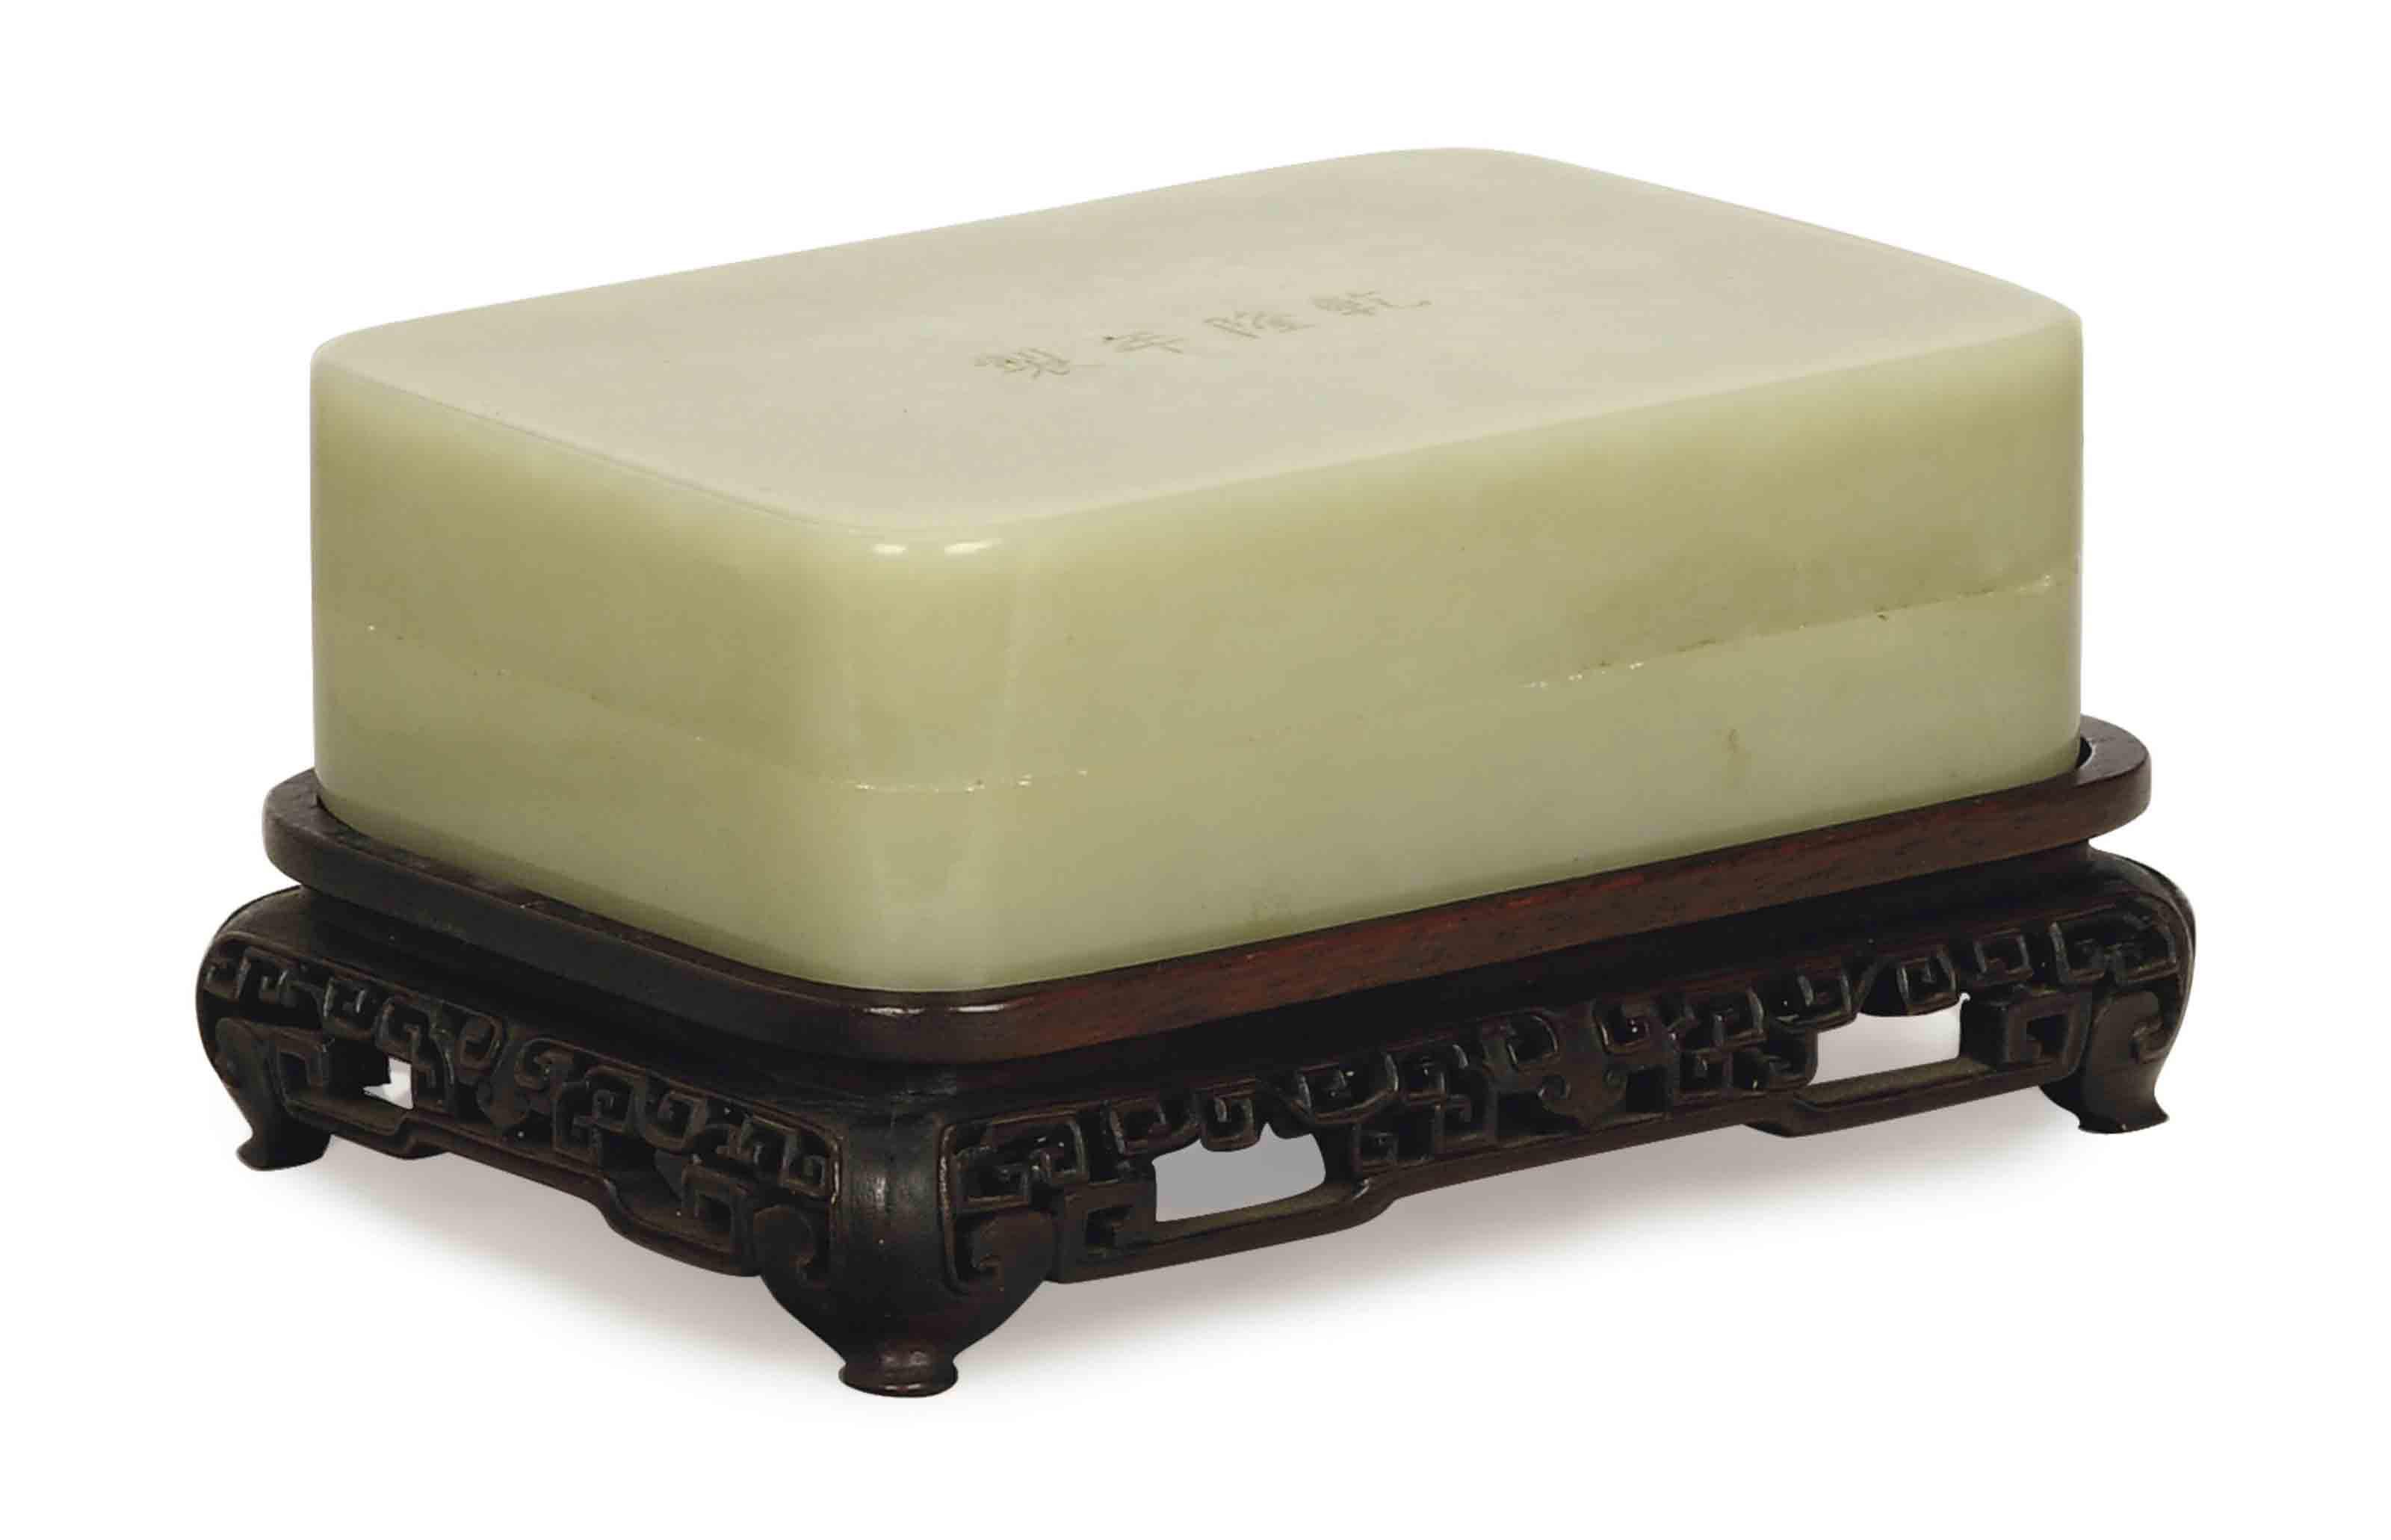 A CHINESE GREENISH JADE BOX AN